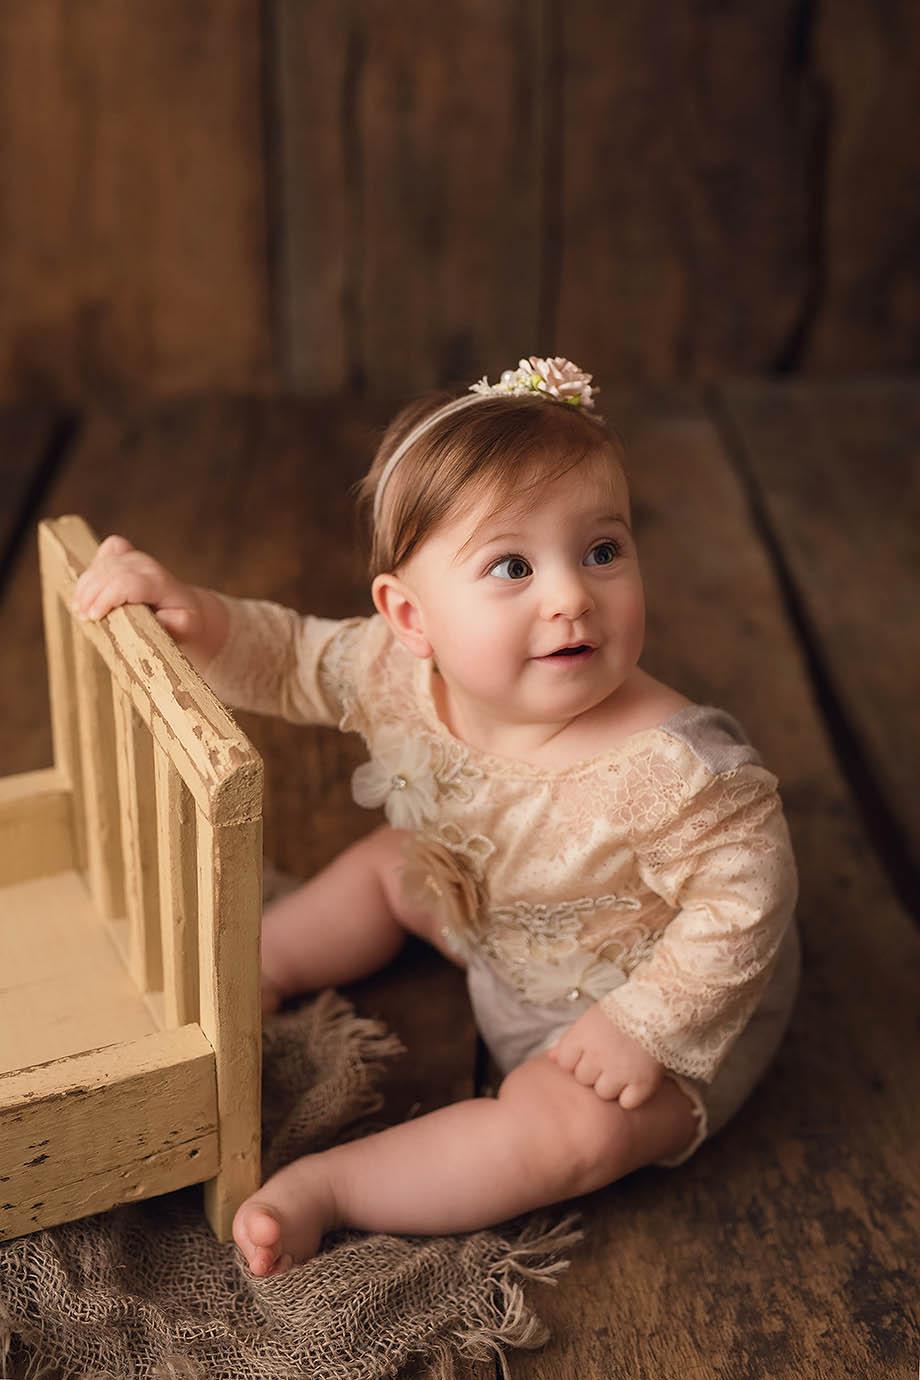 kinderfotograf-kinderfotoshooting-babyfotograf-babyshooting-nidda-frankfurt-creme-vintage-altrosa-beige-katharina-herzen-shooting-nidda